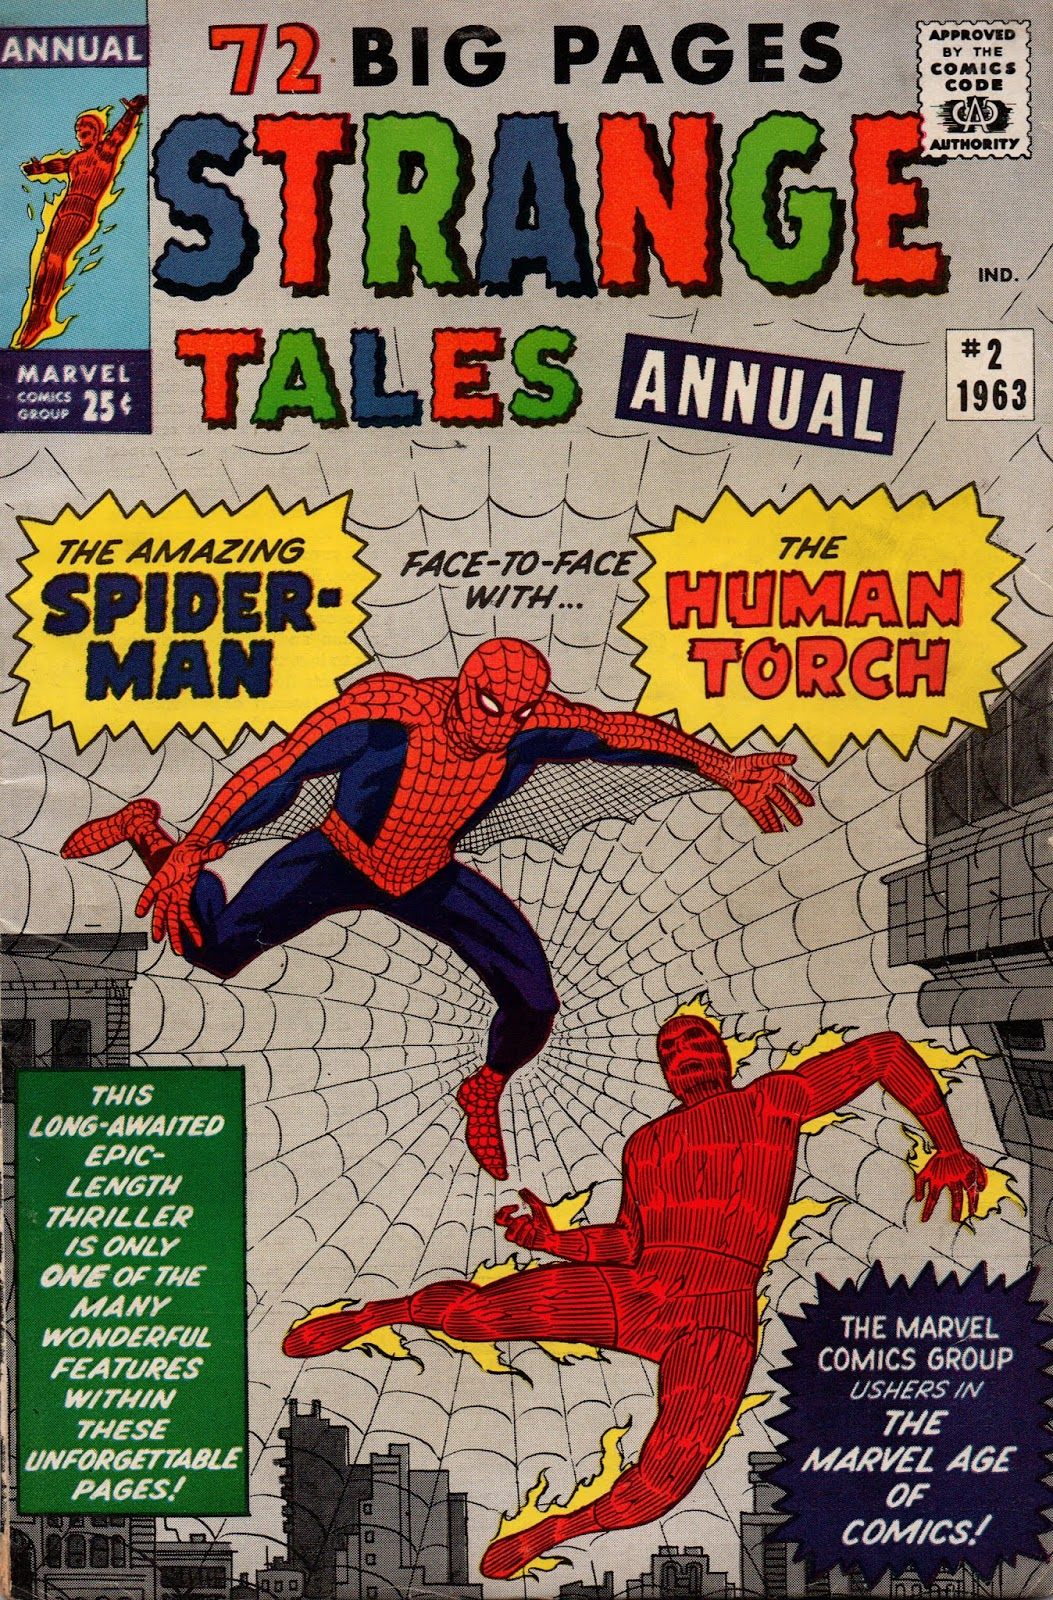 Marvel Mysteries and Comics Minutiae: 55 Summers Ago: Fantastic Four ...